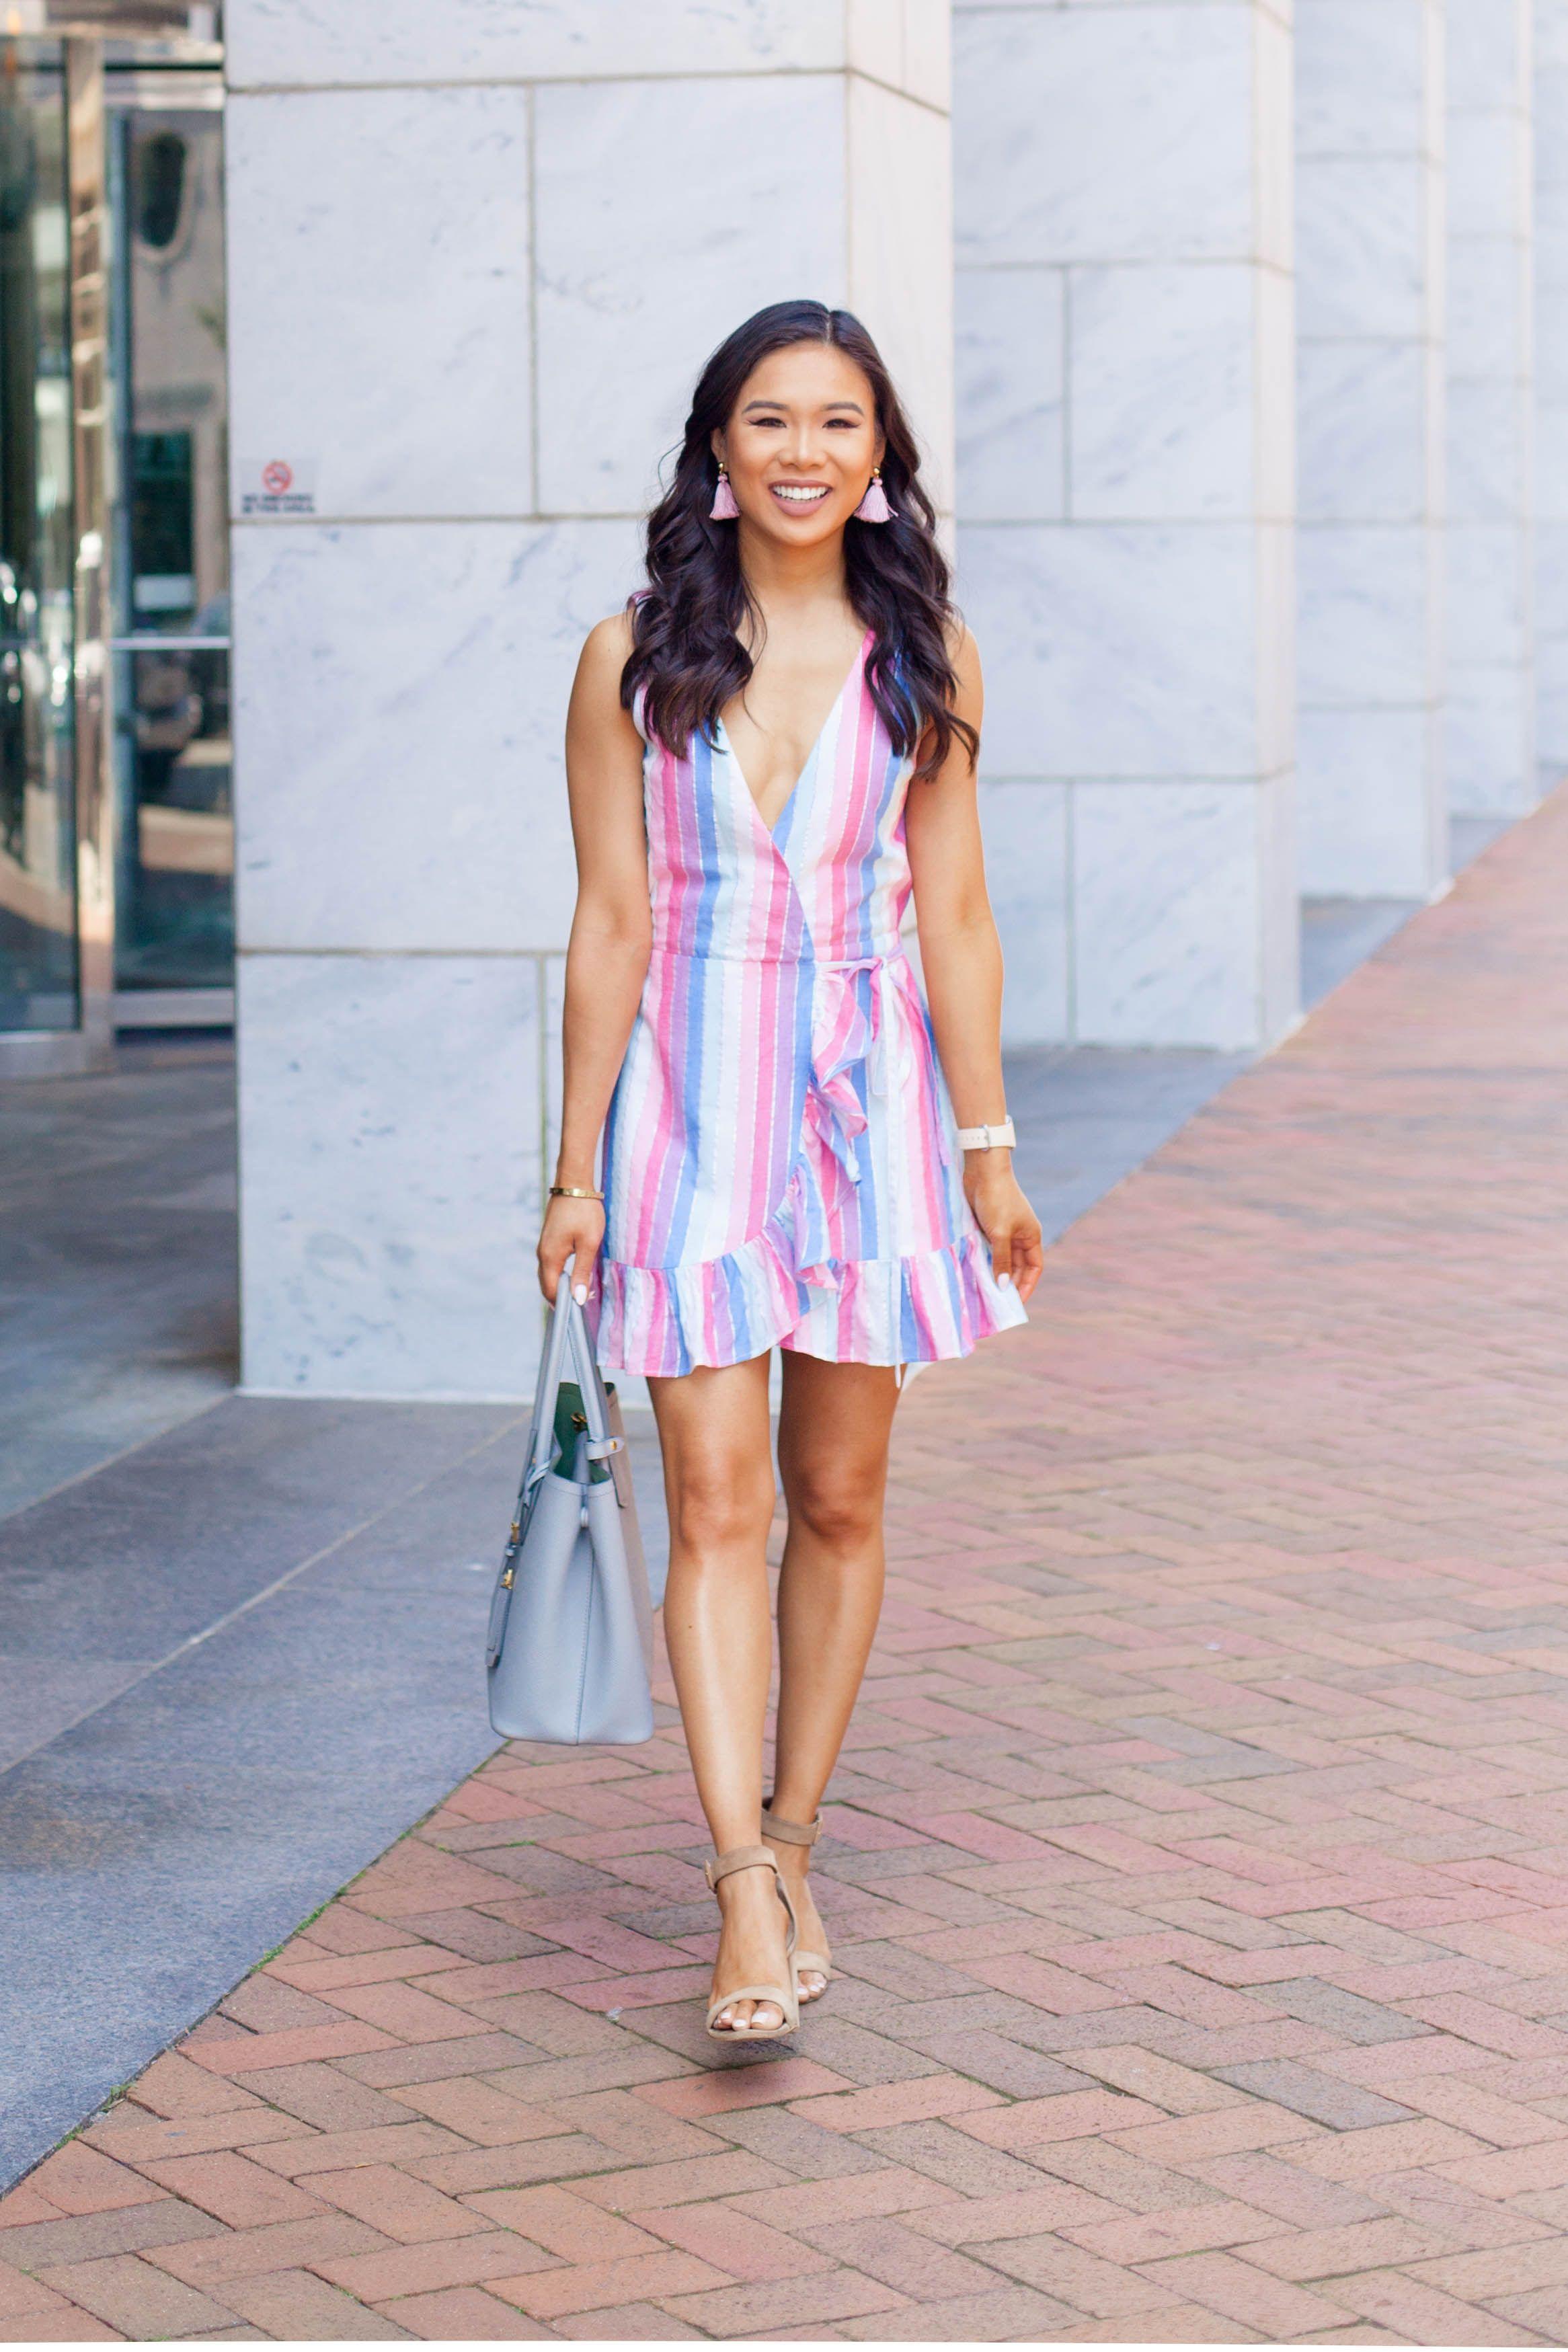 Pastel Rainbow Striped Summer Dress Color Chic Striped Dress Summer Dresses Simple Summer Outfits [ 3498 x 2332 Pixel ]